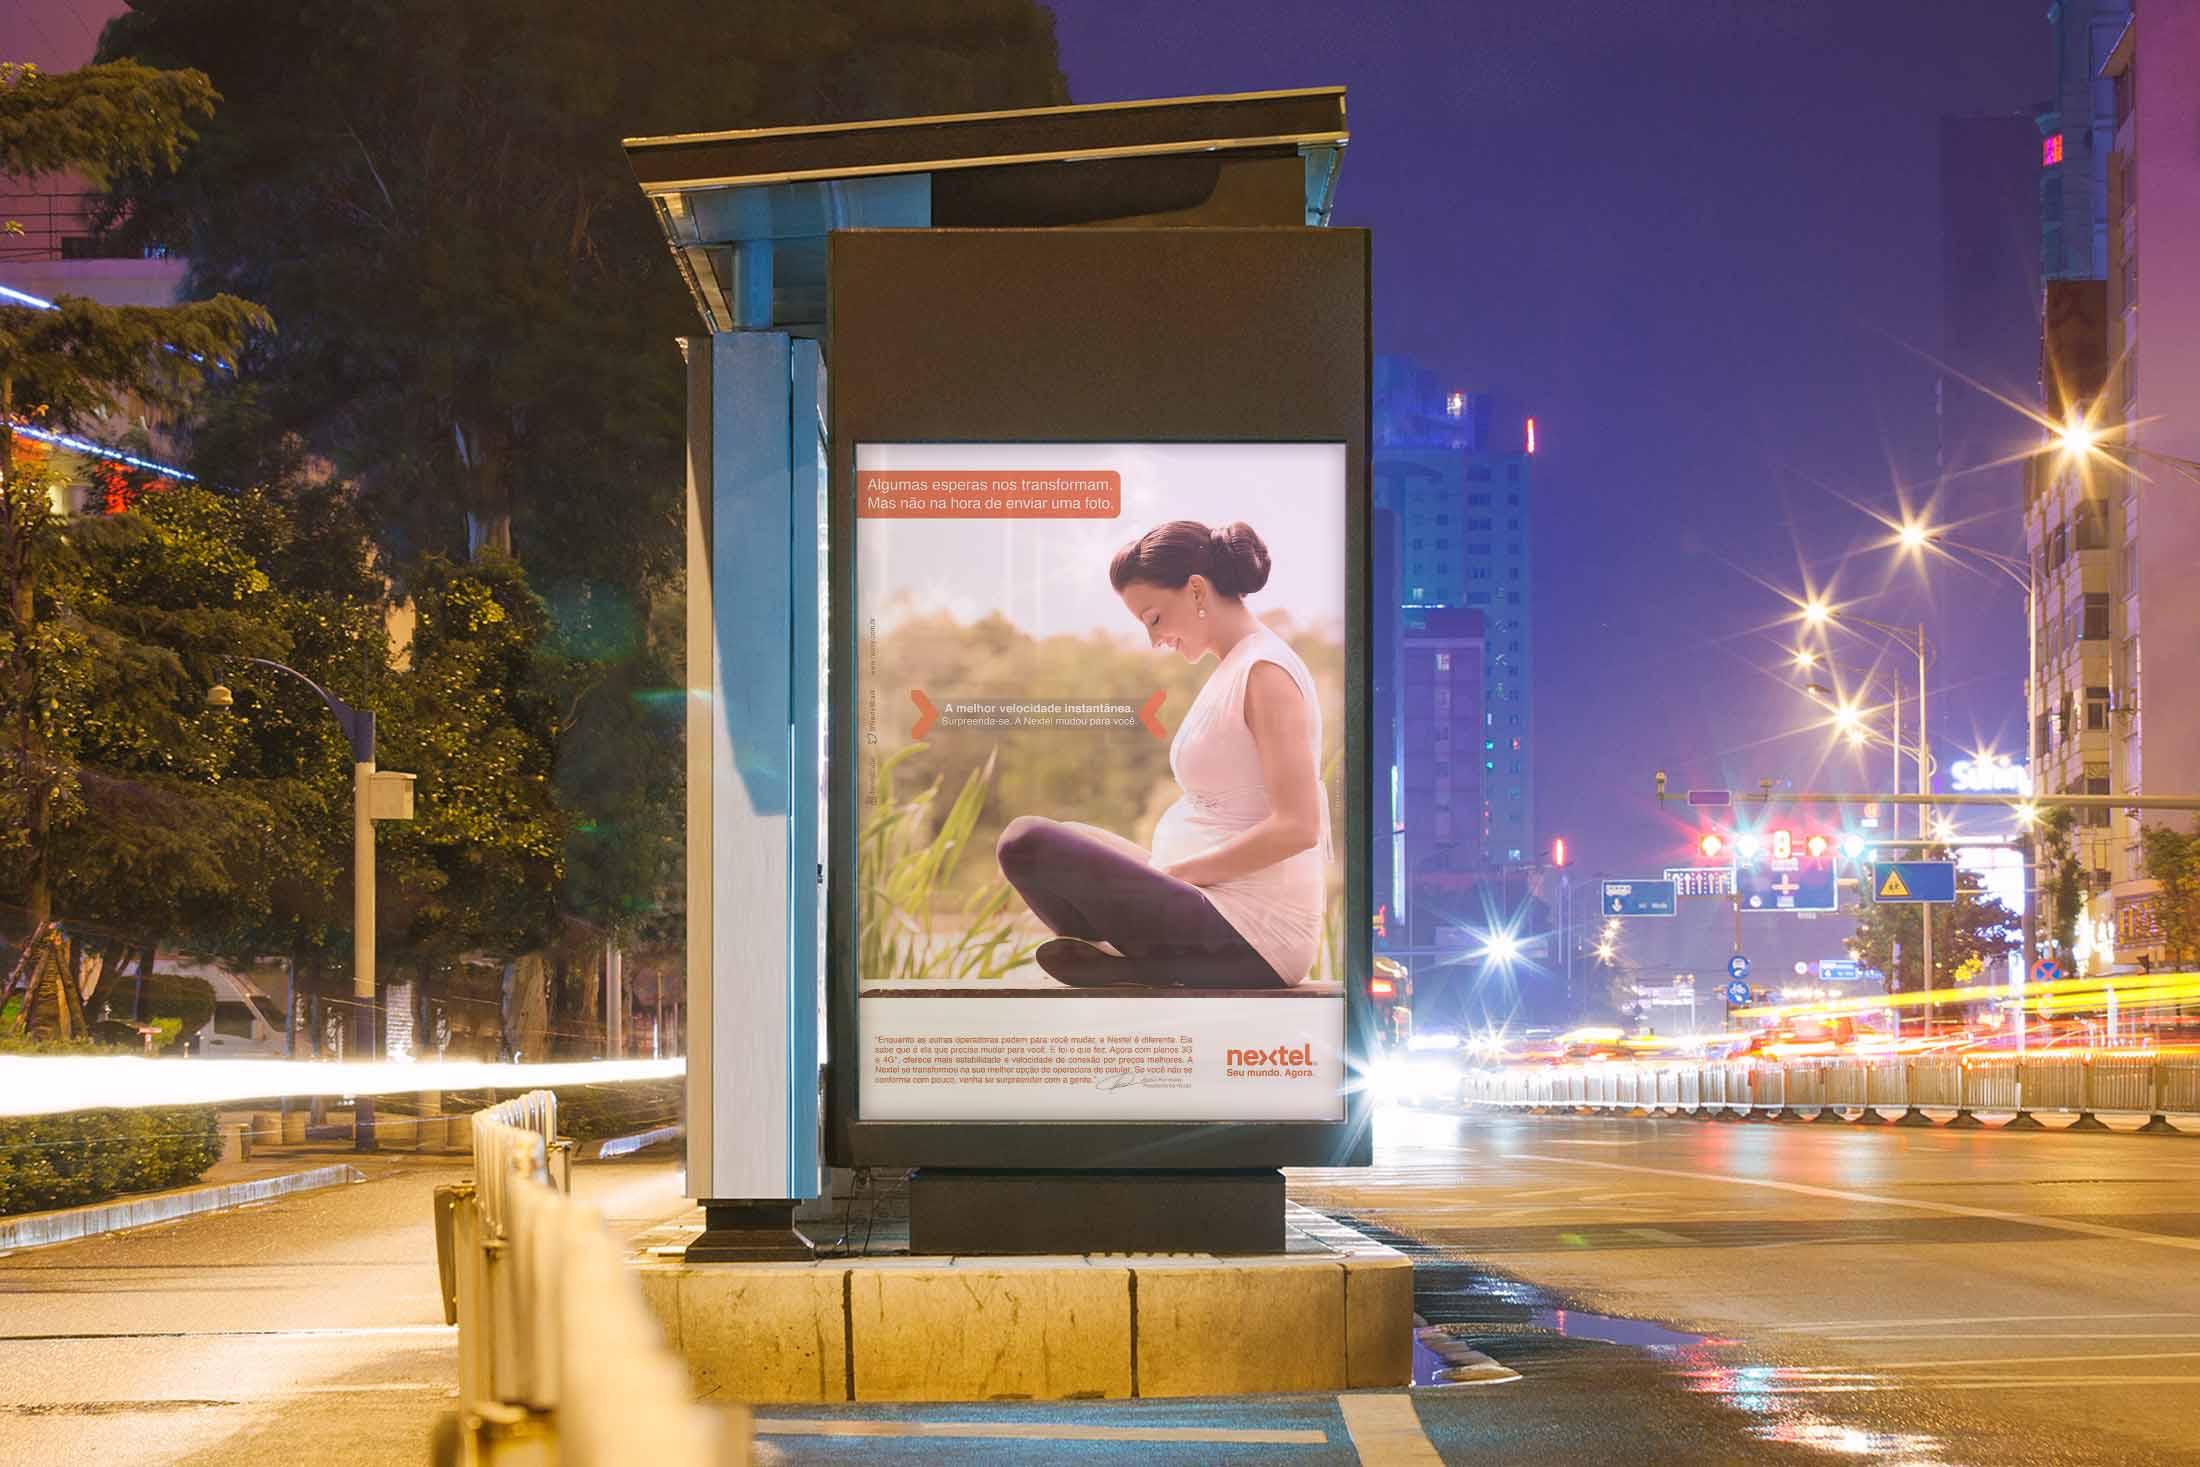 Bus Stop mockup by Freepik.